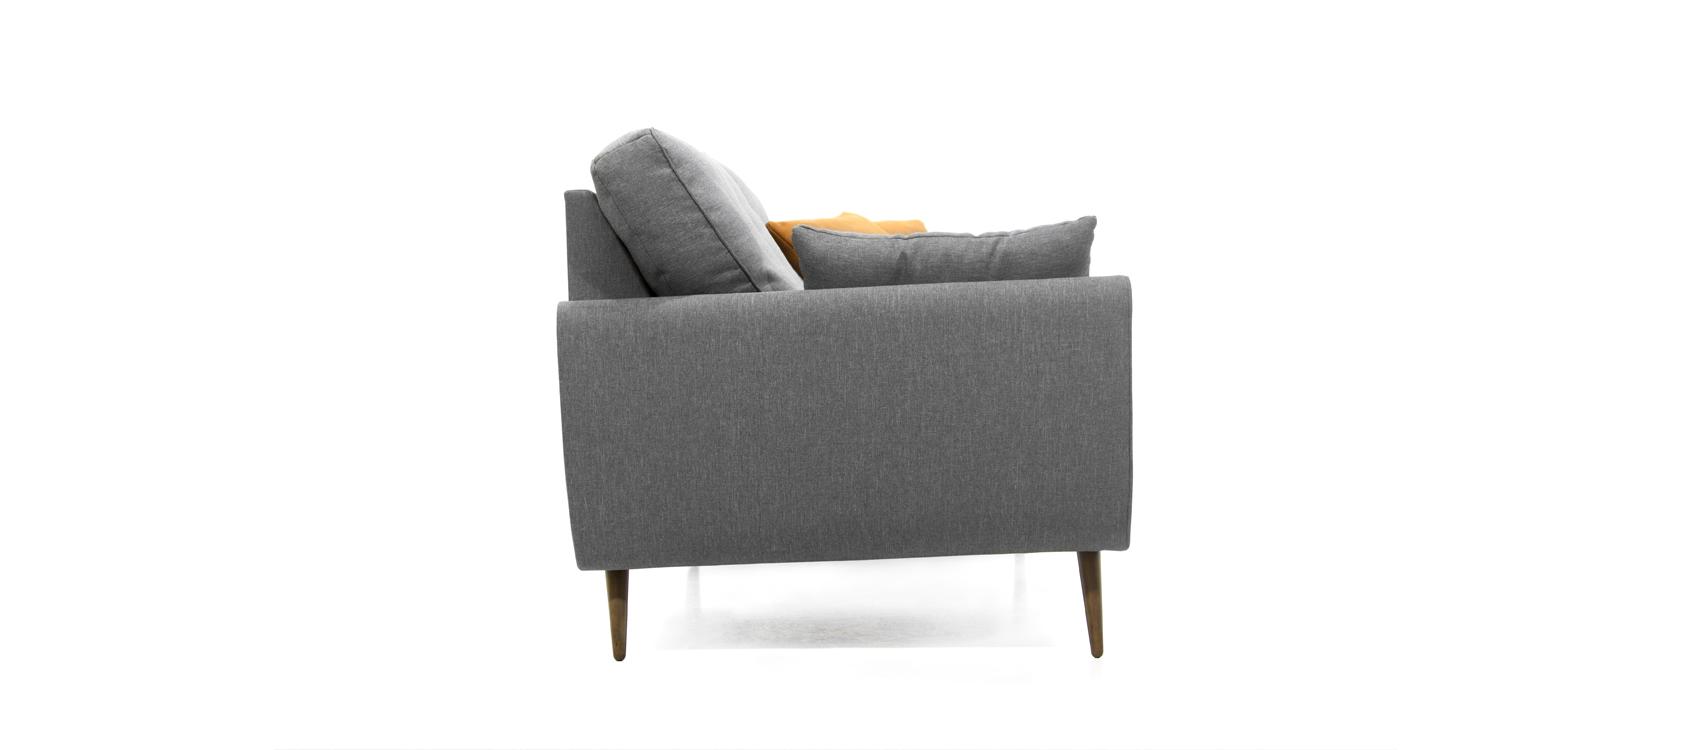 Sofa MALMO фото 6